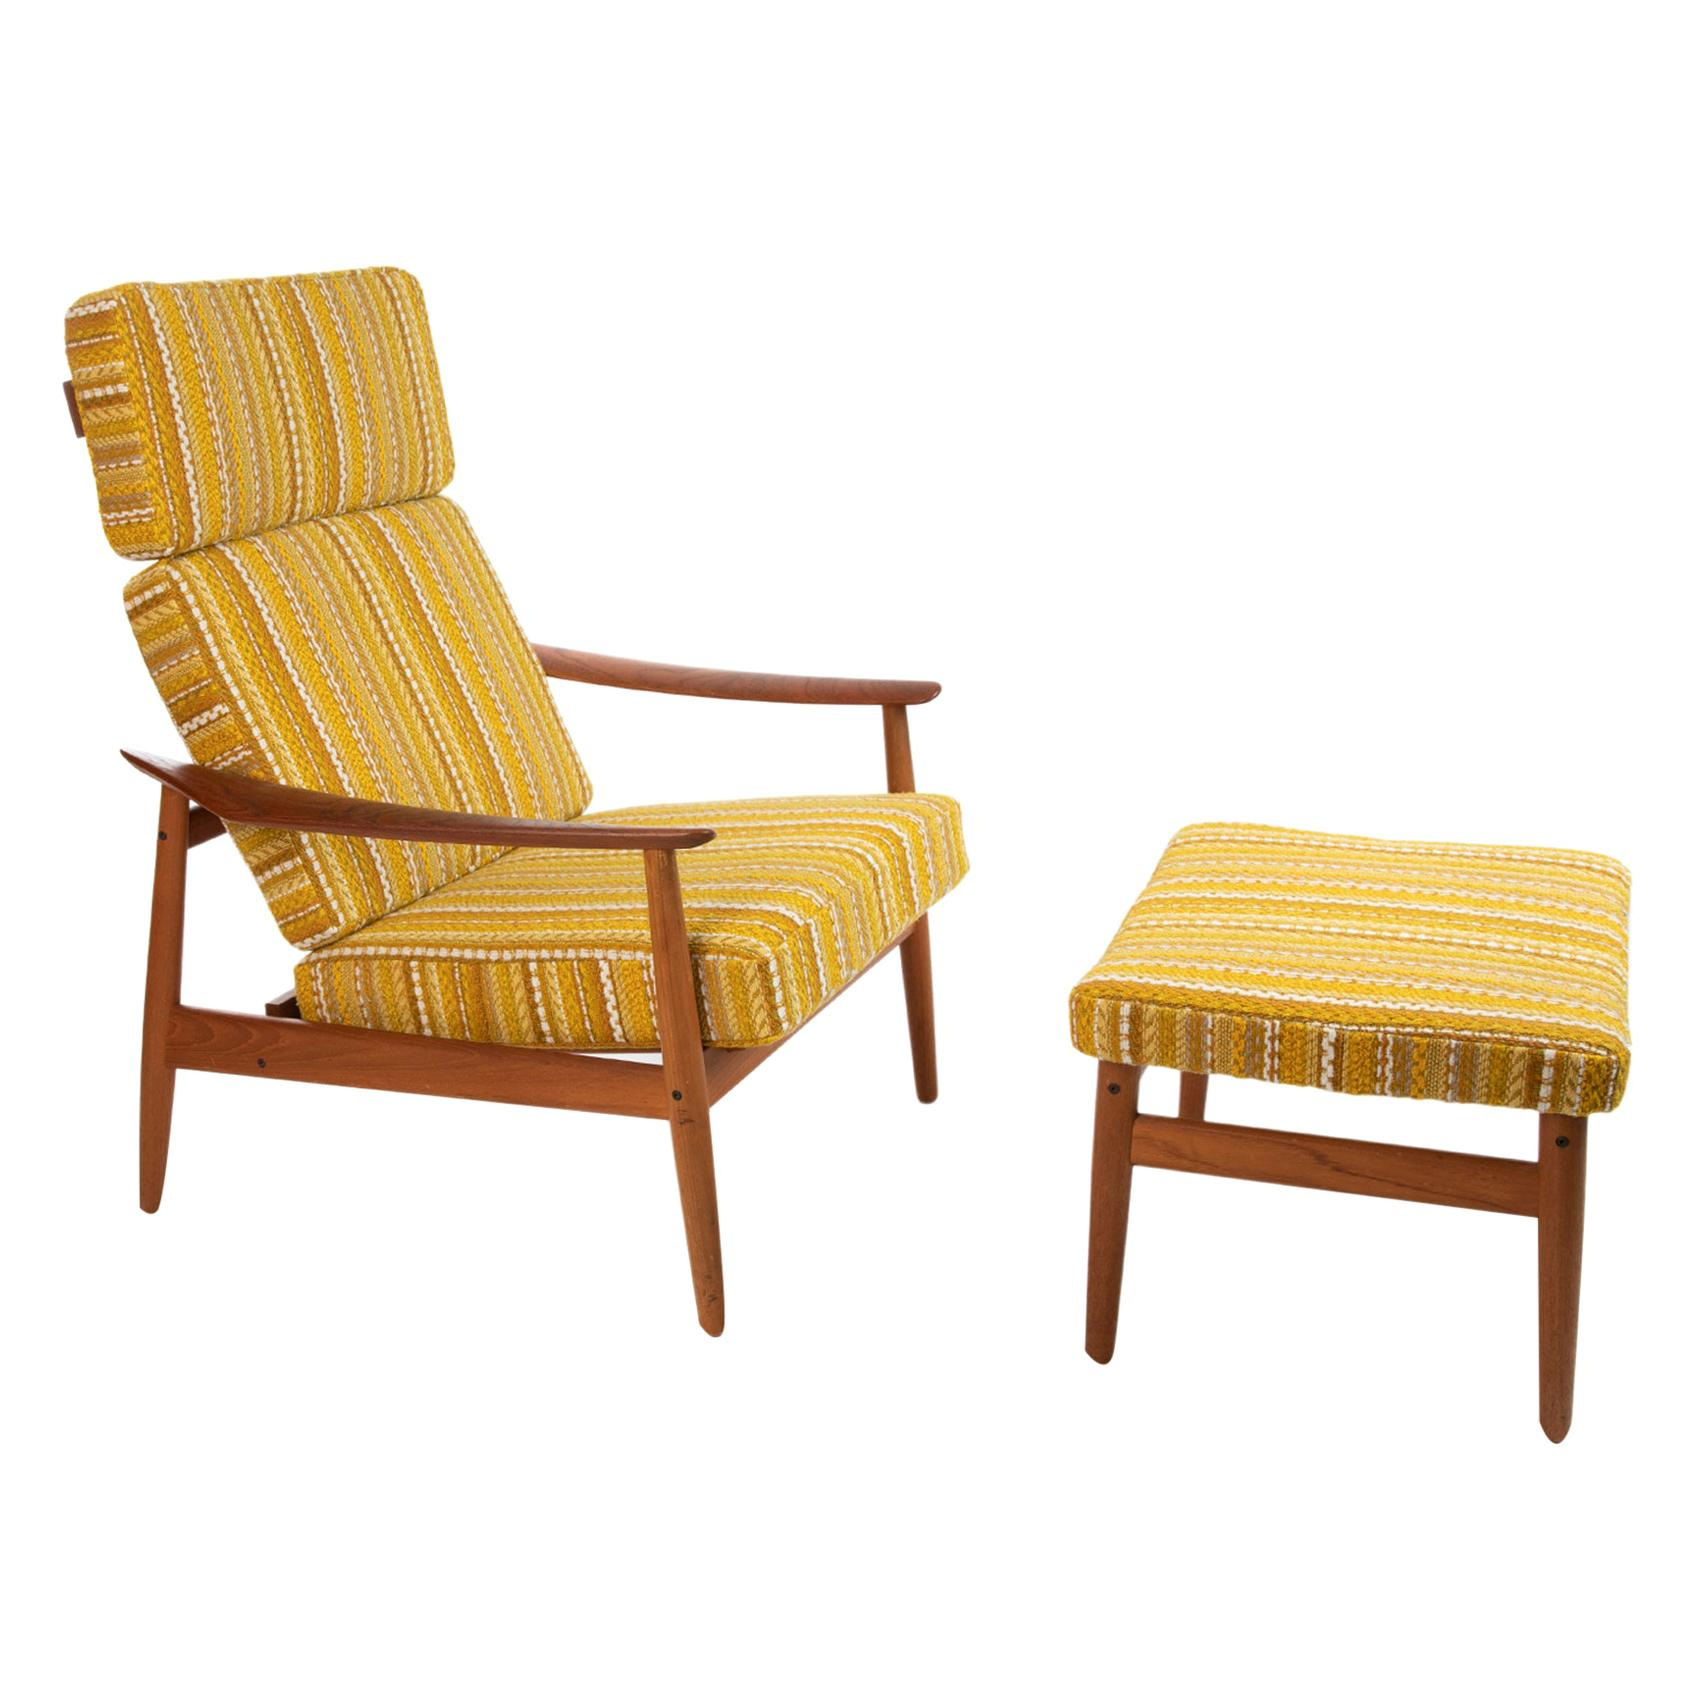 FD-164 Reclining Lounge Chair